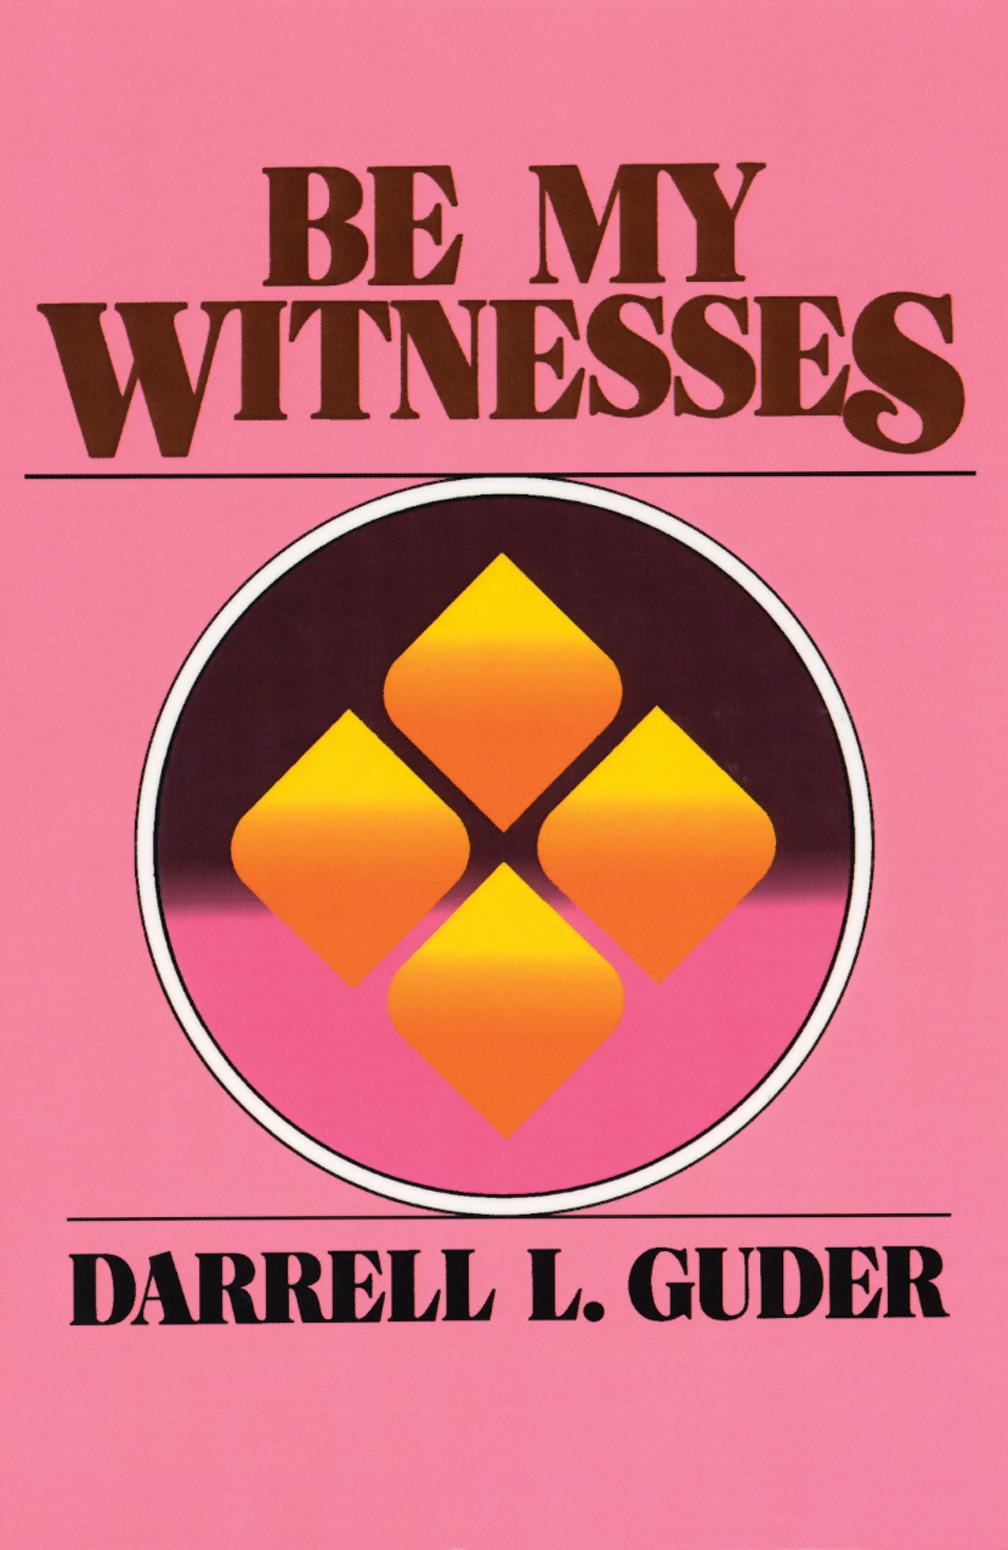 Be My Witnesses - Darrell L. Guder : Eerdmans